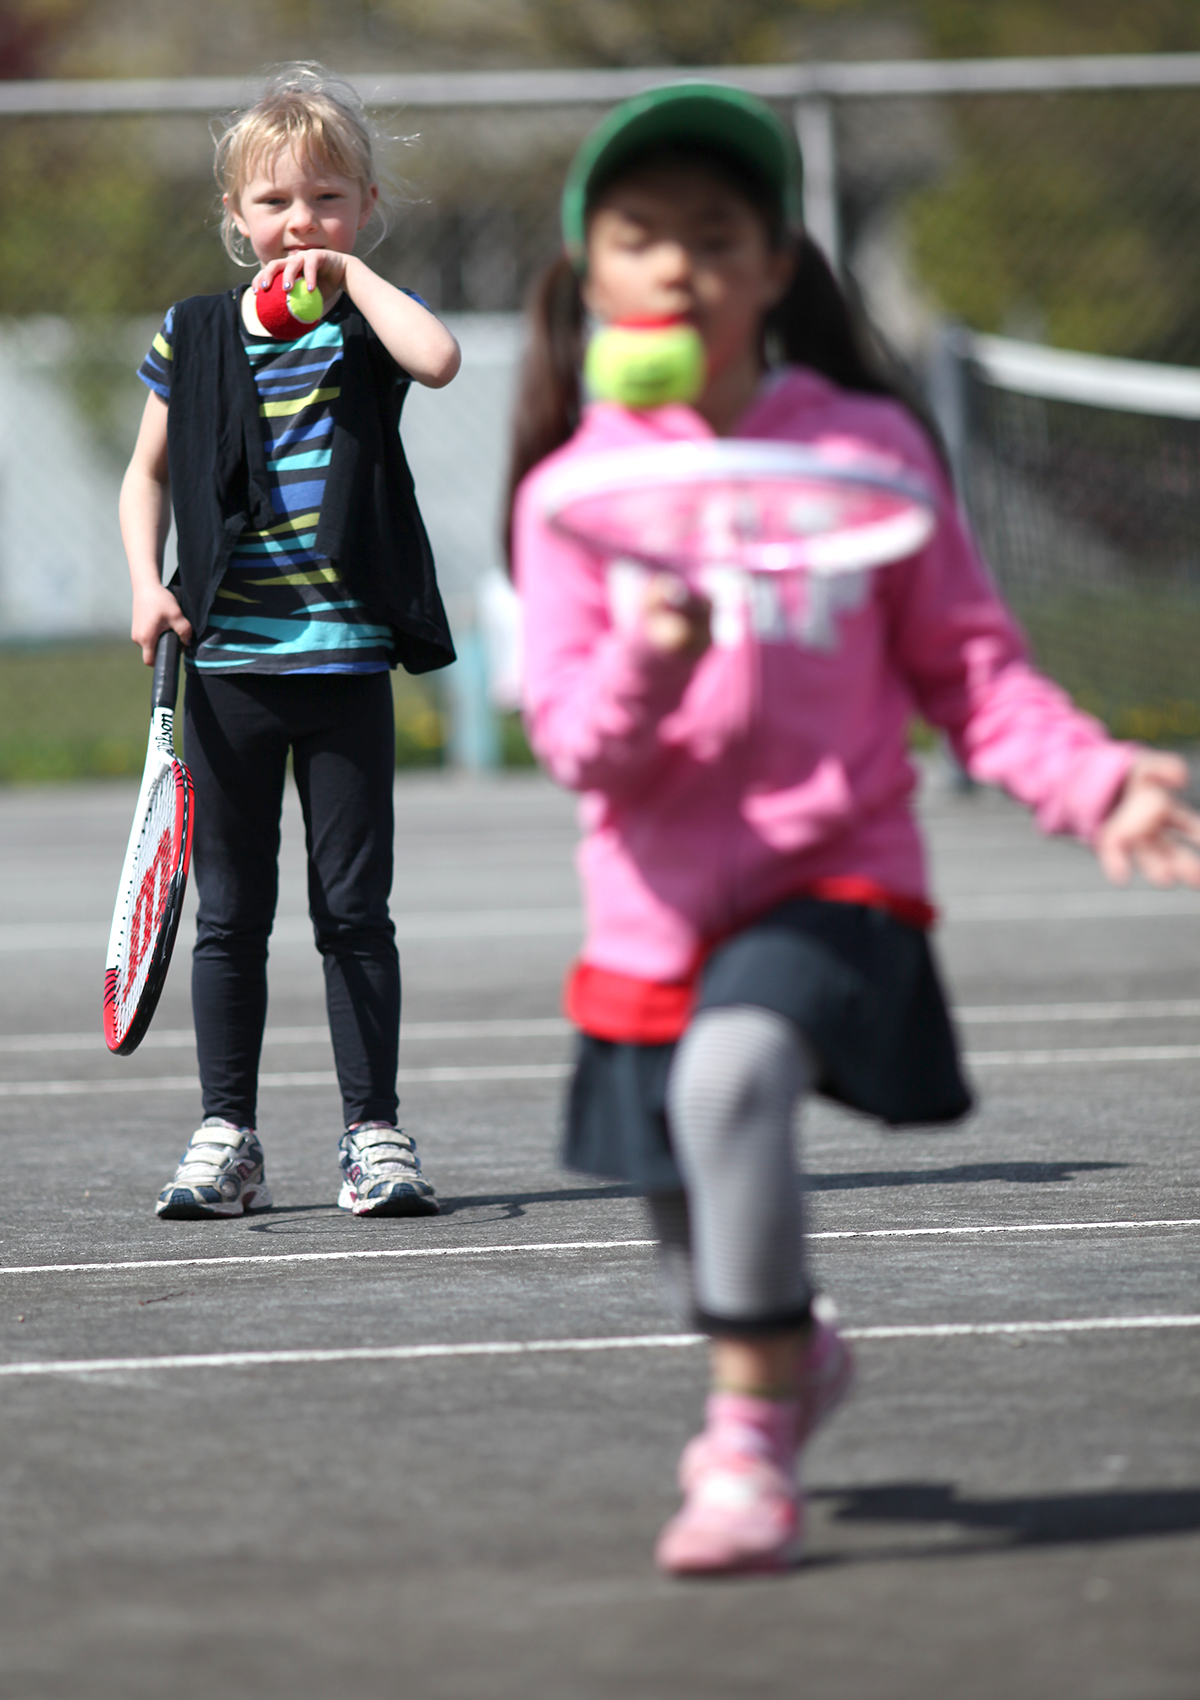 tennis_GHT_kids-bouncing-ball.png